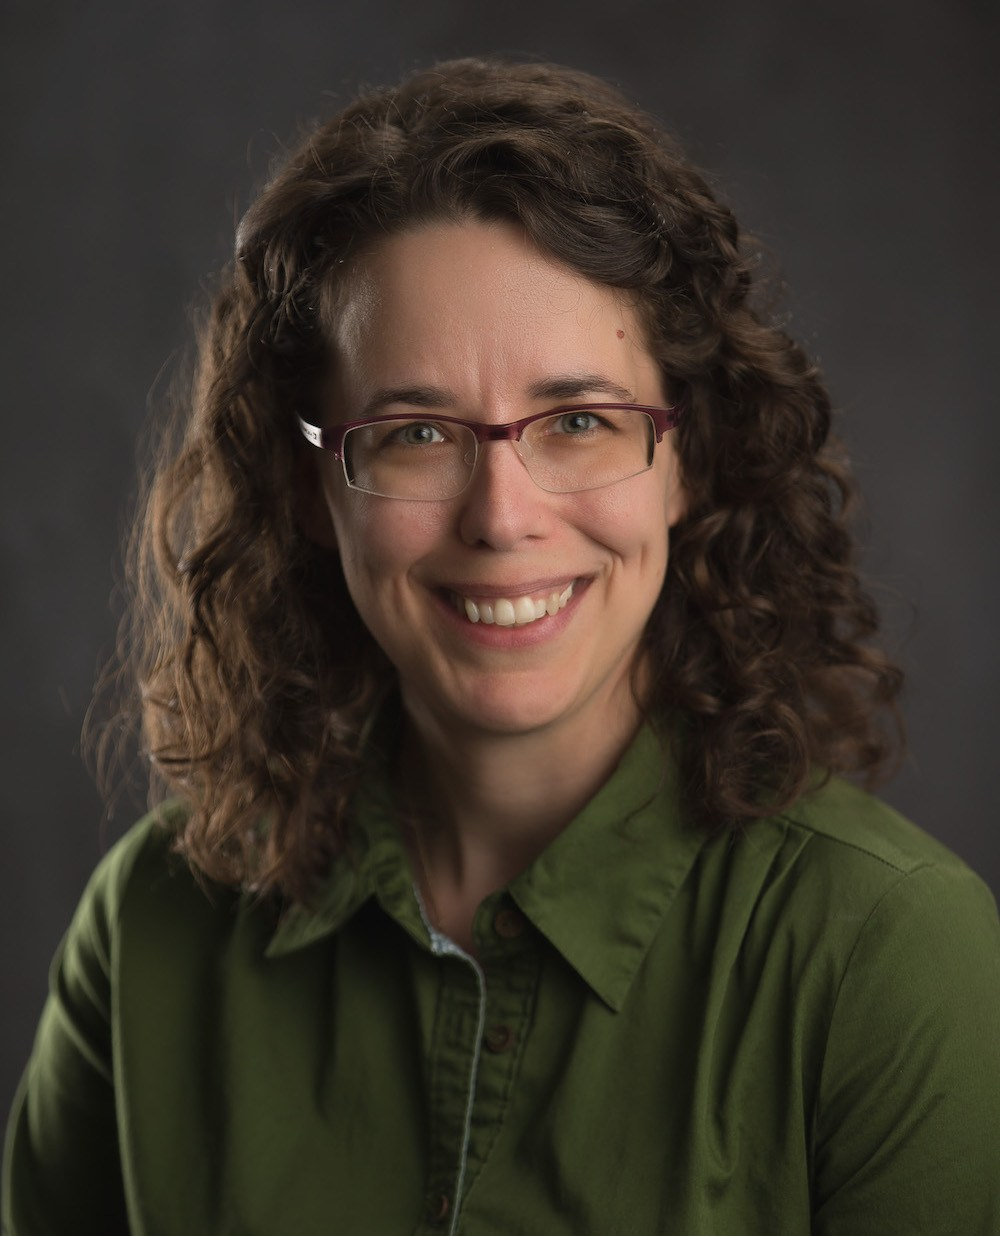 A Few Words With: Editor Extraordinaire Jane Friedman